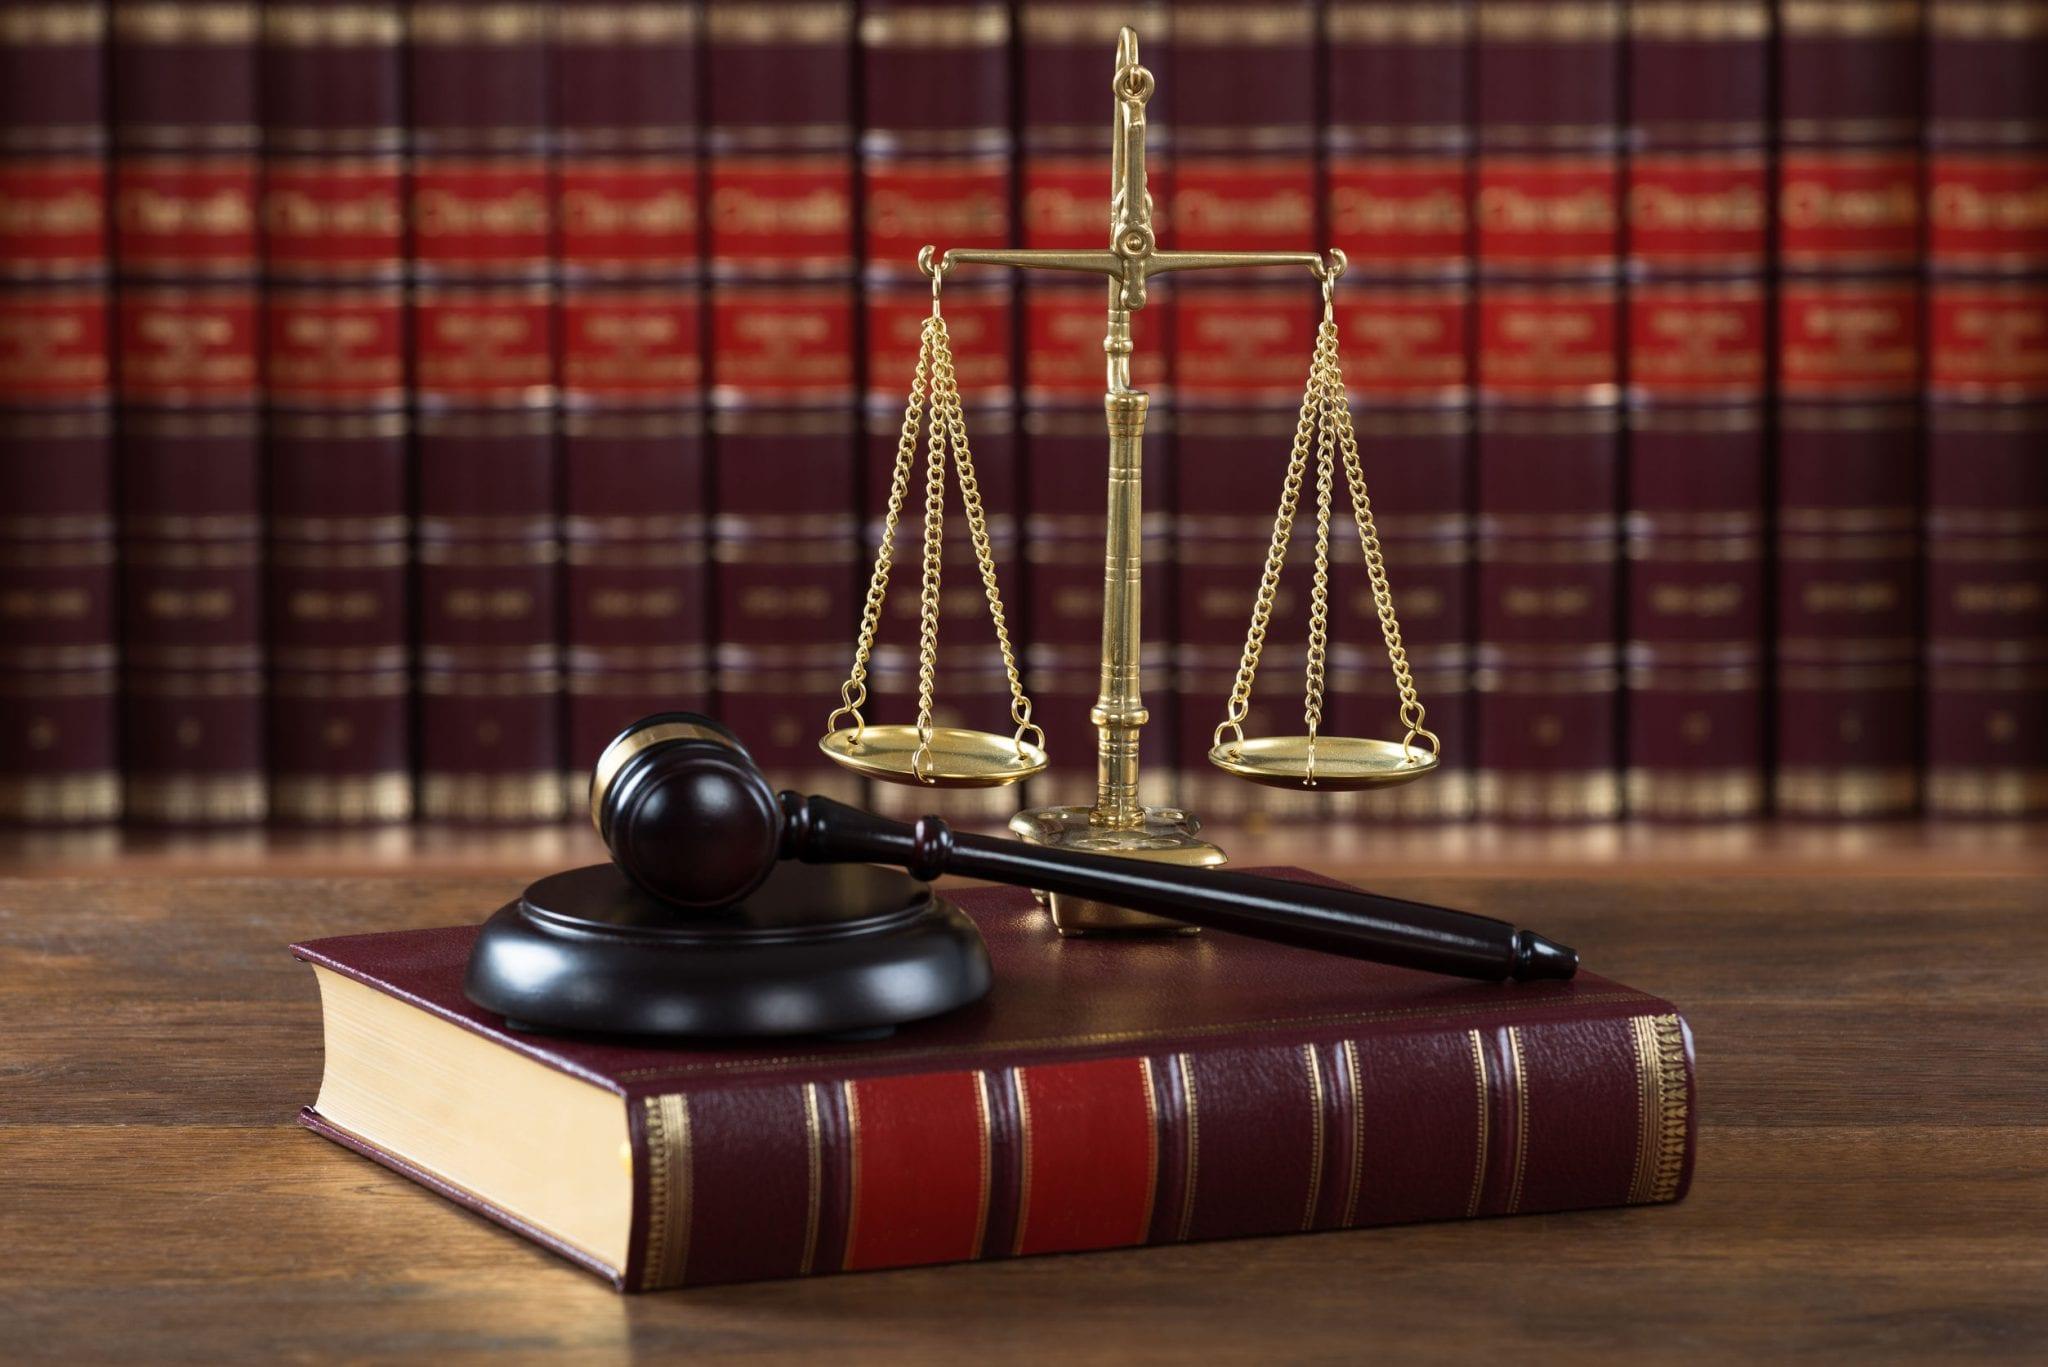 Texas White Collar Crimes Lawyer